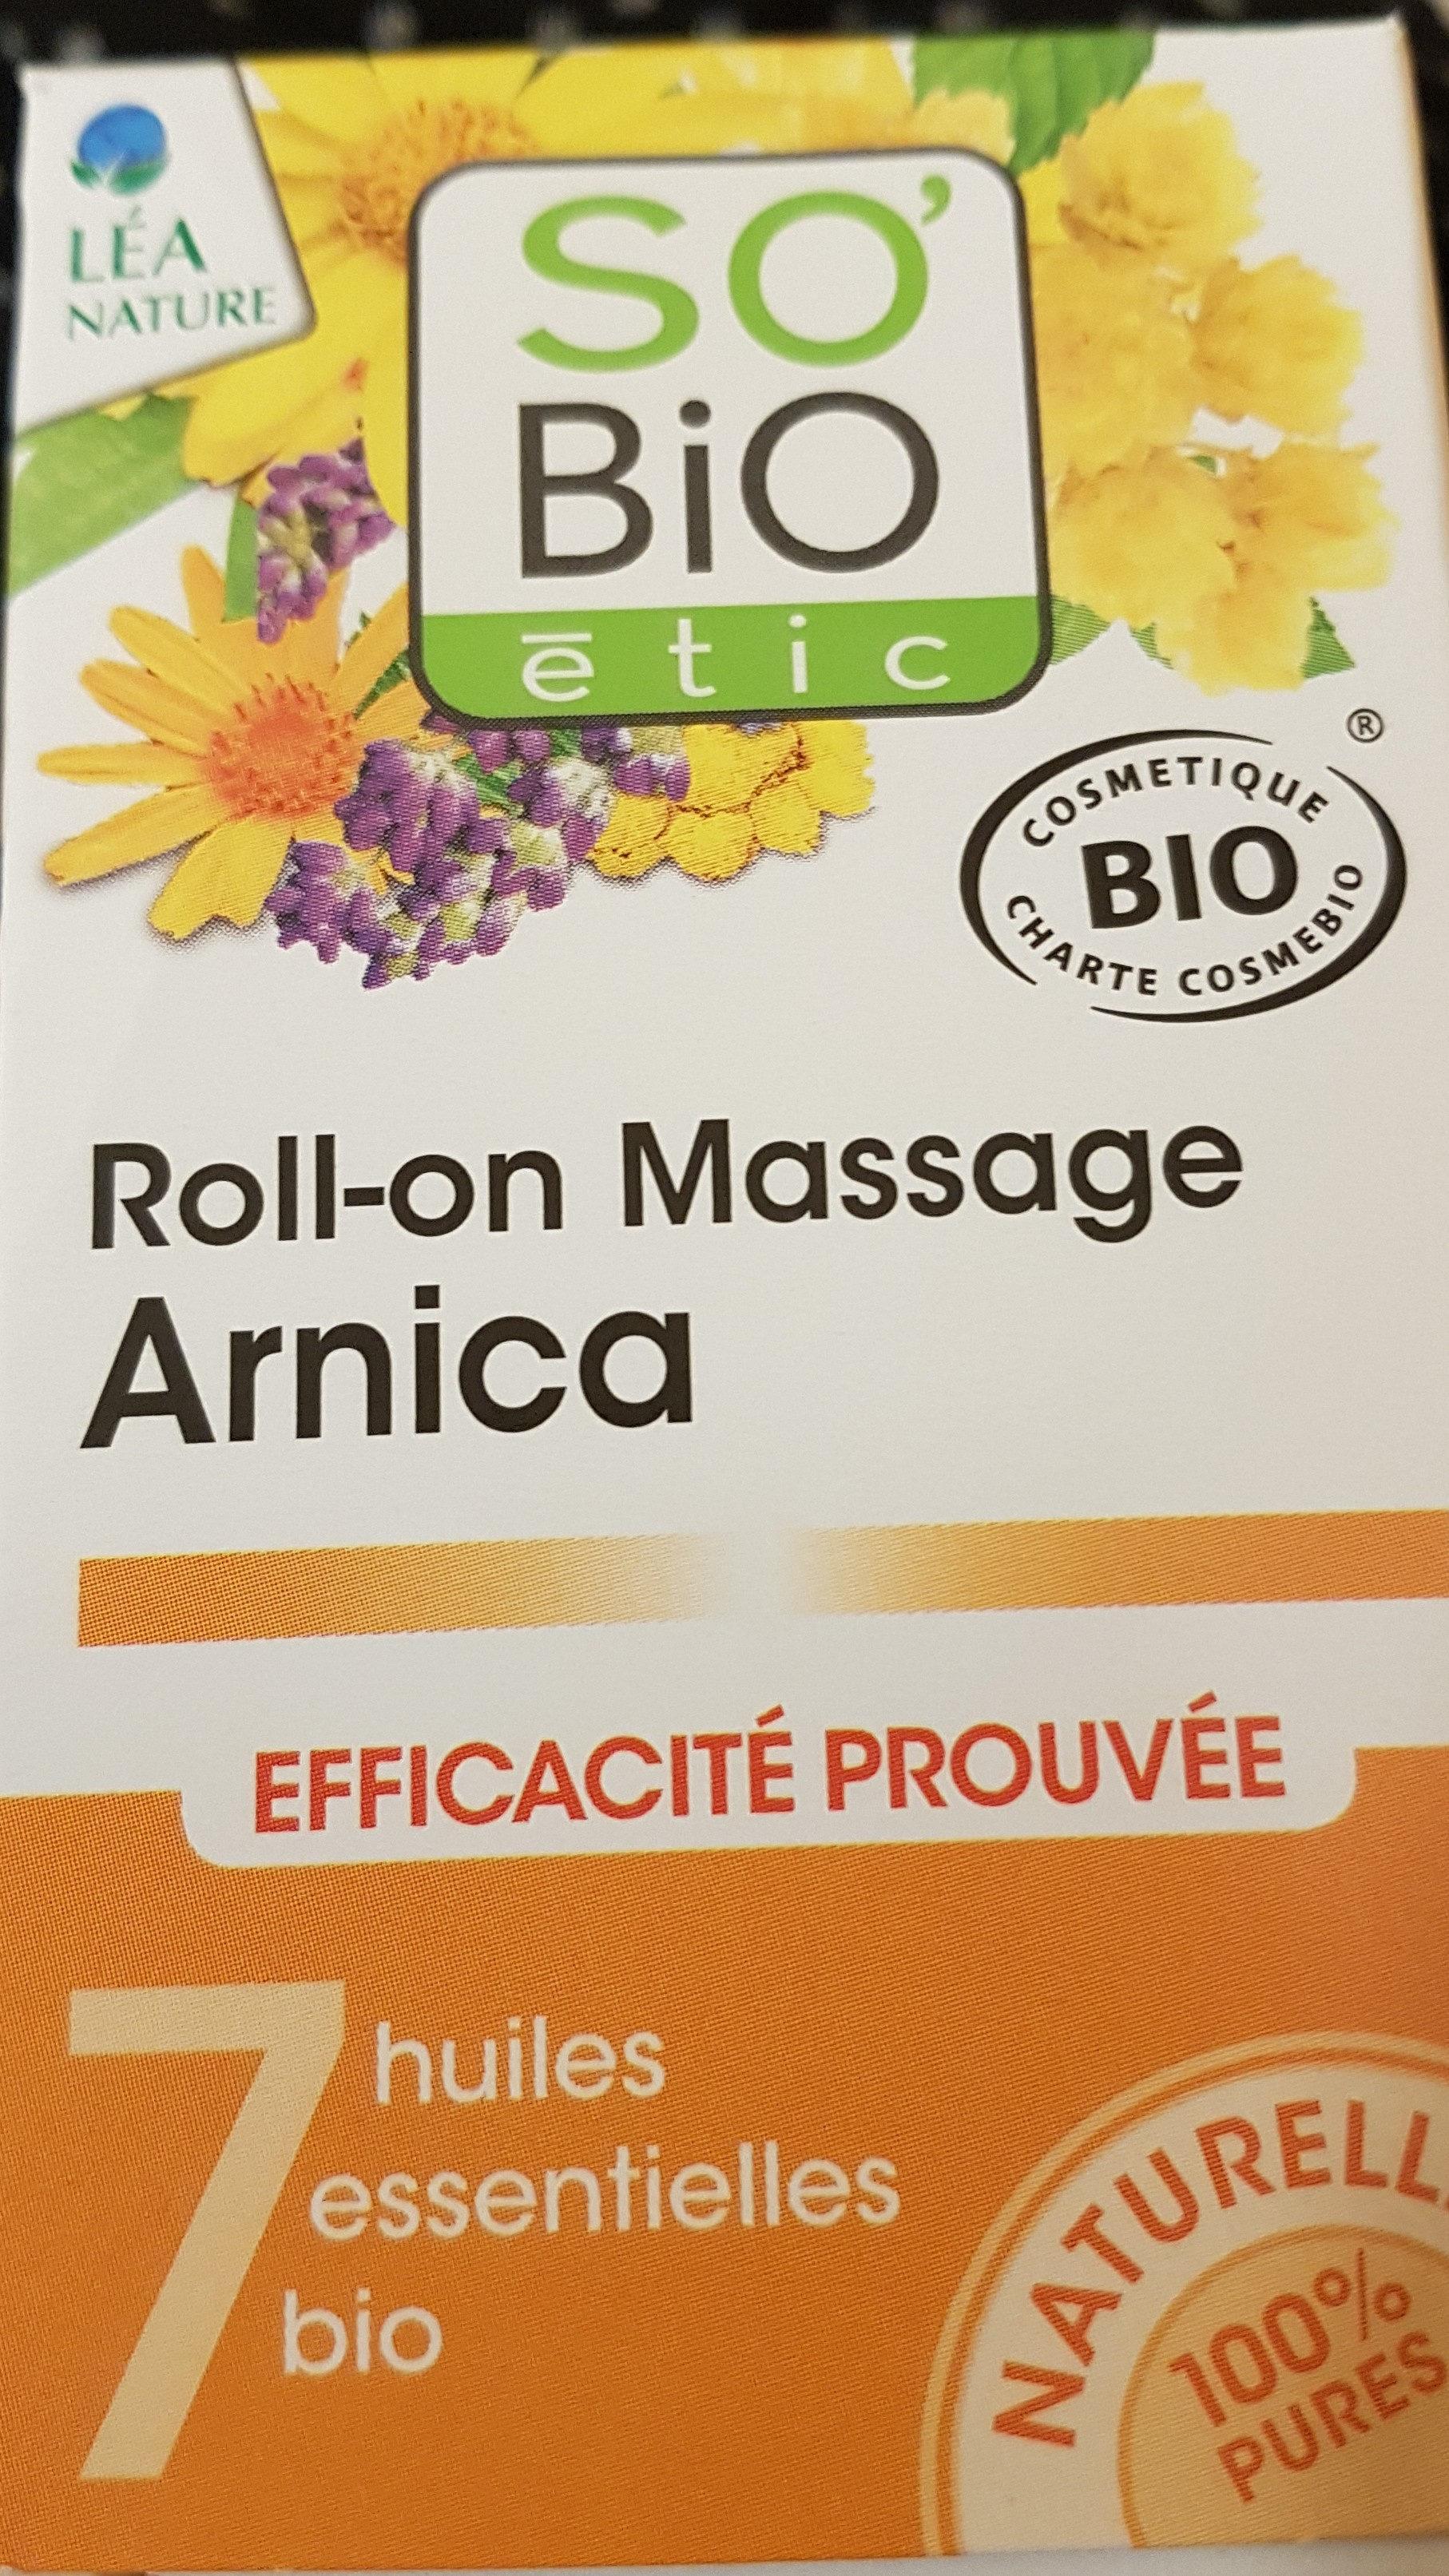 Roll-on Massage Arnica - Produit